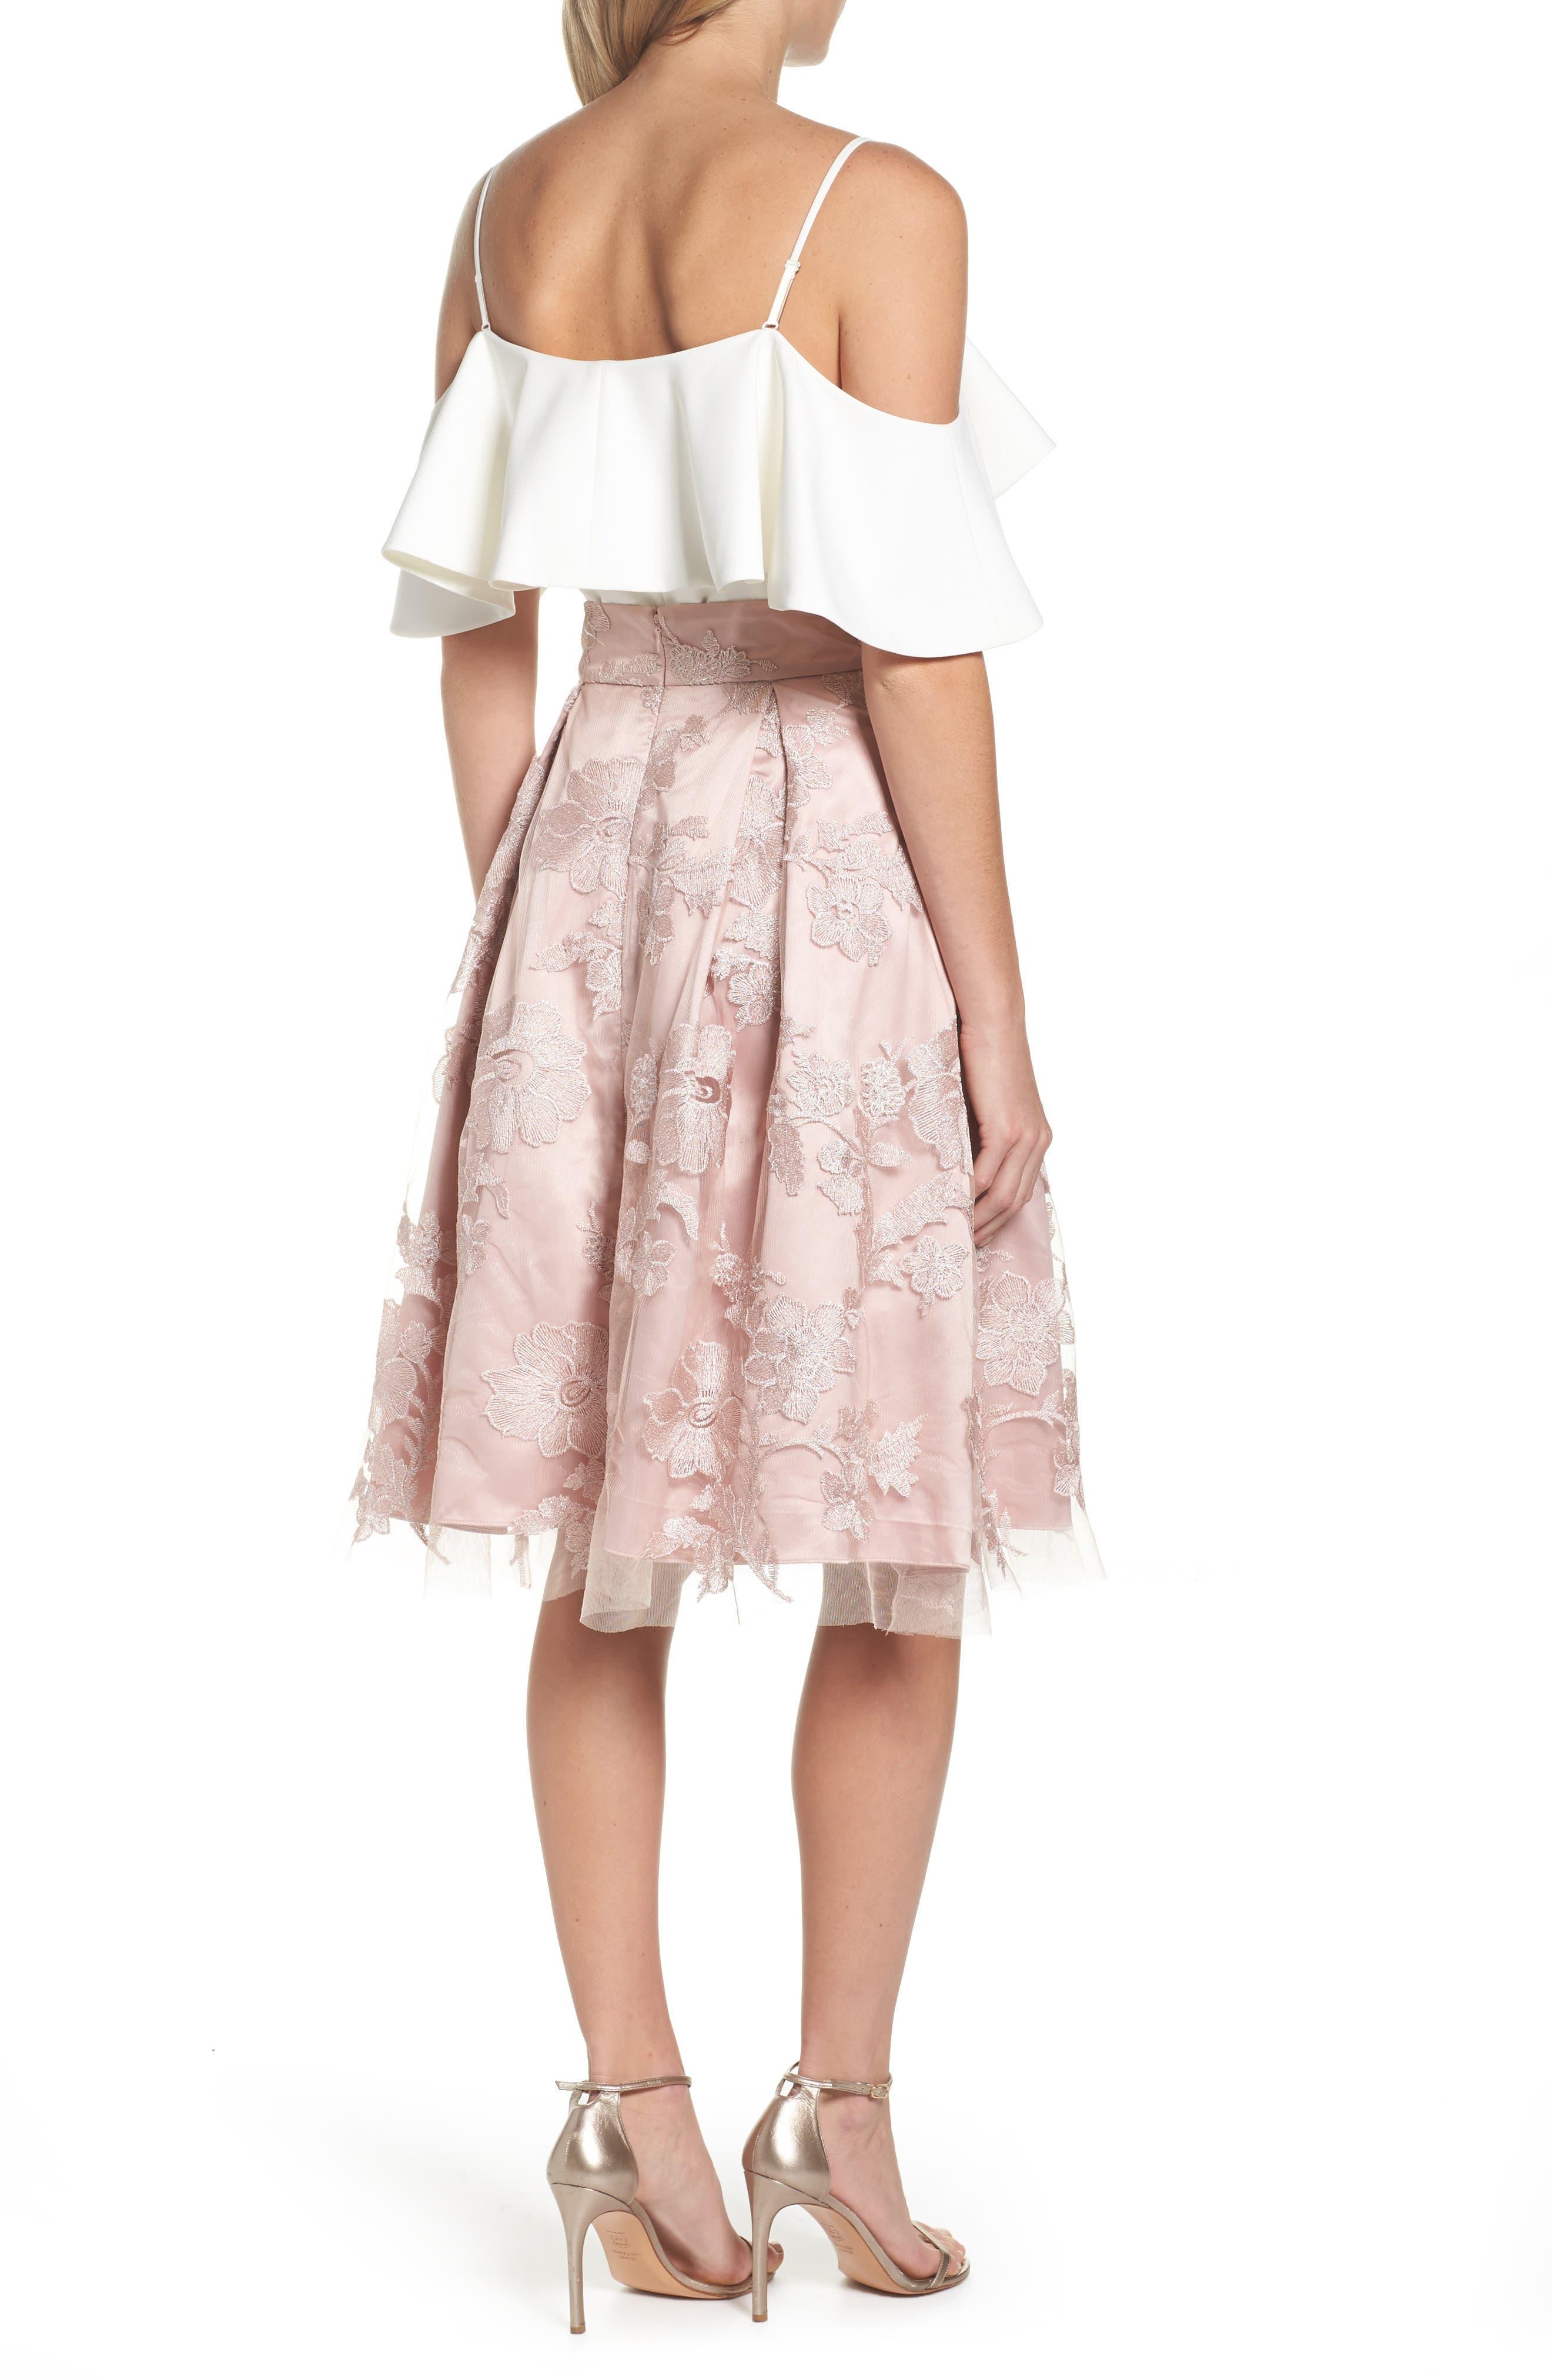 ELIZA J, Floral Embroidered Skirt, Alternate thumbnail 8, color, 254